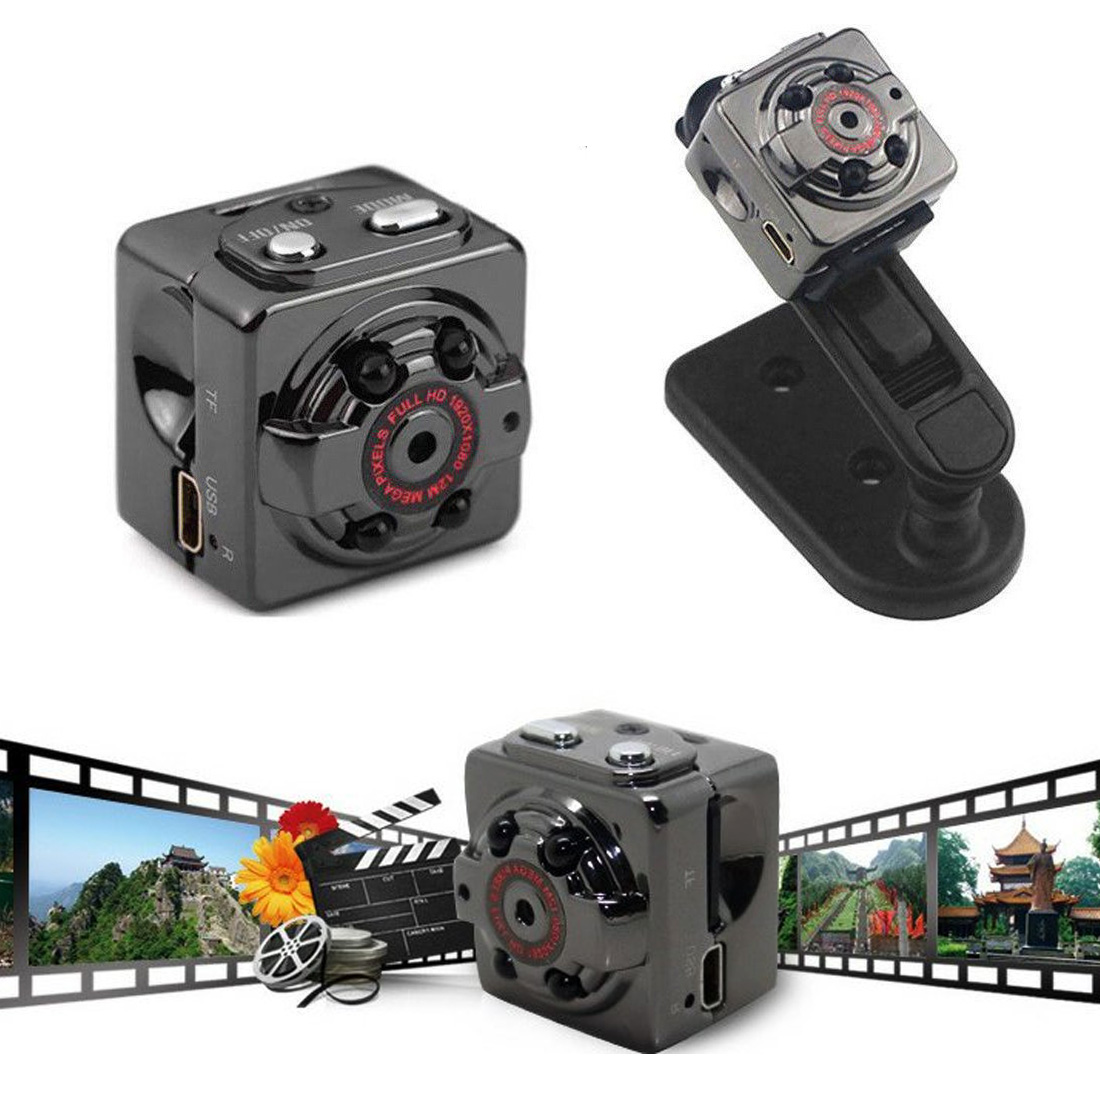 SQ8 Mini Camera Smart Dv Camcorder 1080P Full HD Wireless Body portable Sport recorder Infrared Night Vision Bicycle Micro Cam|Surveillance Cameras| |  - title=